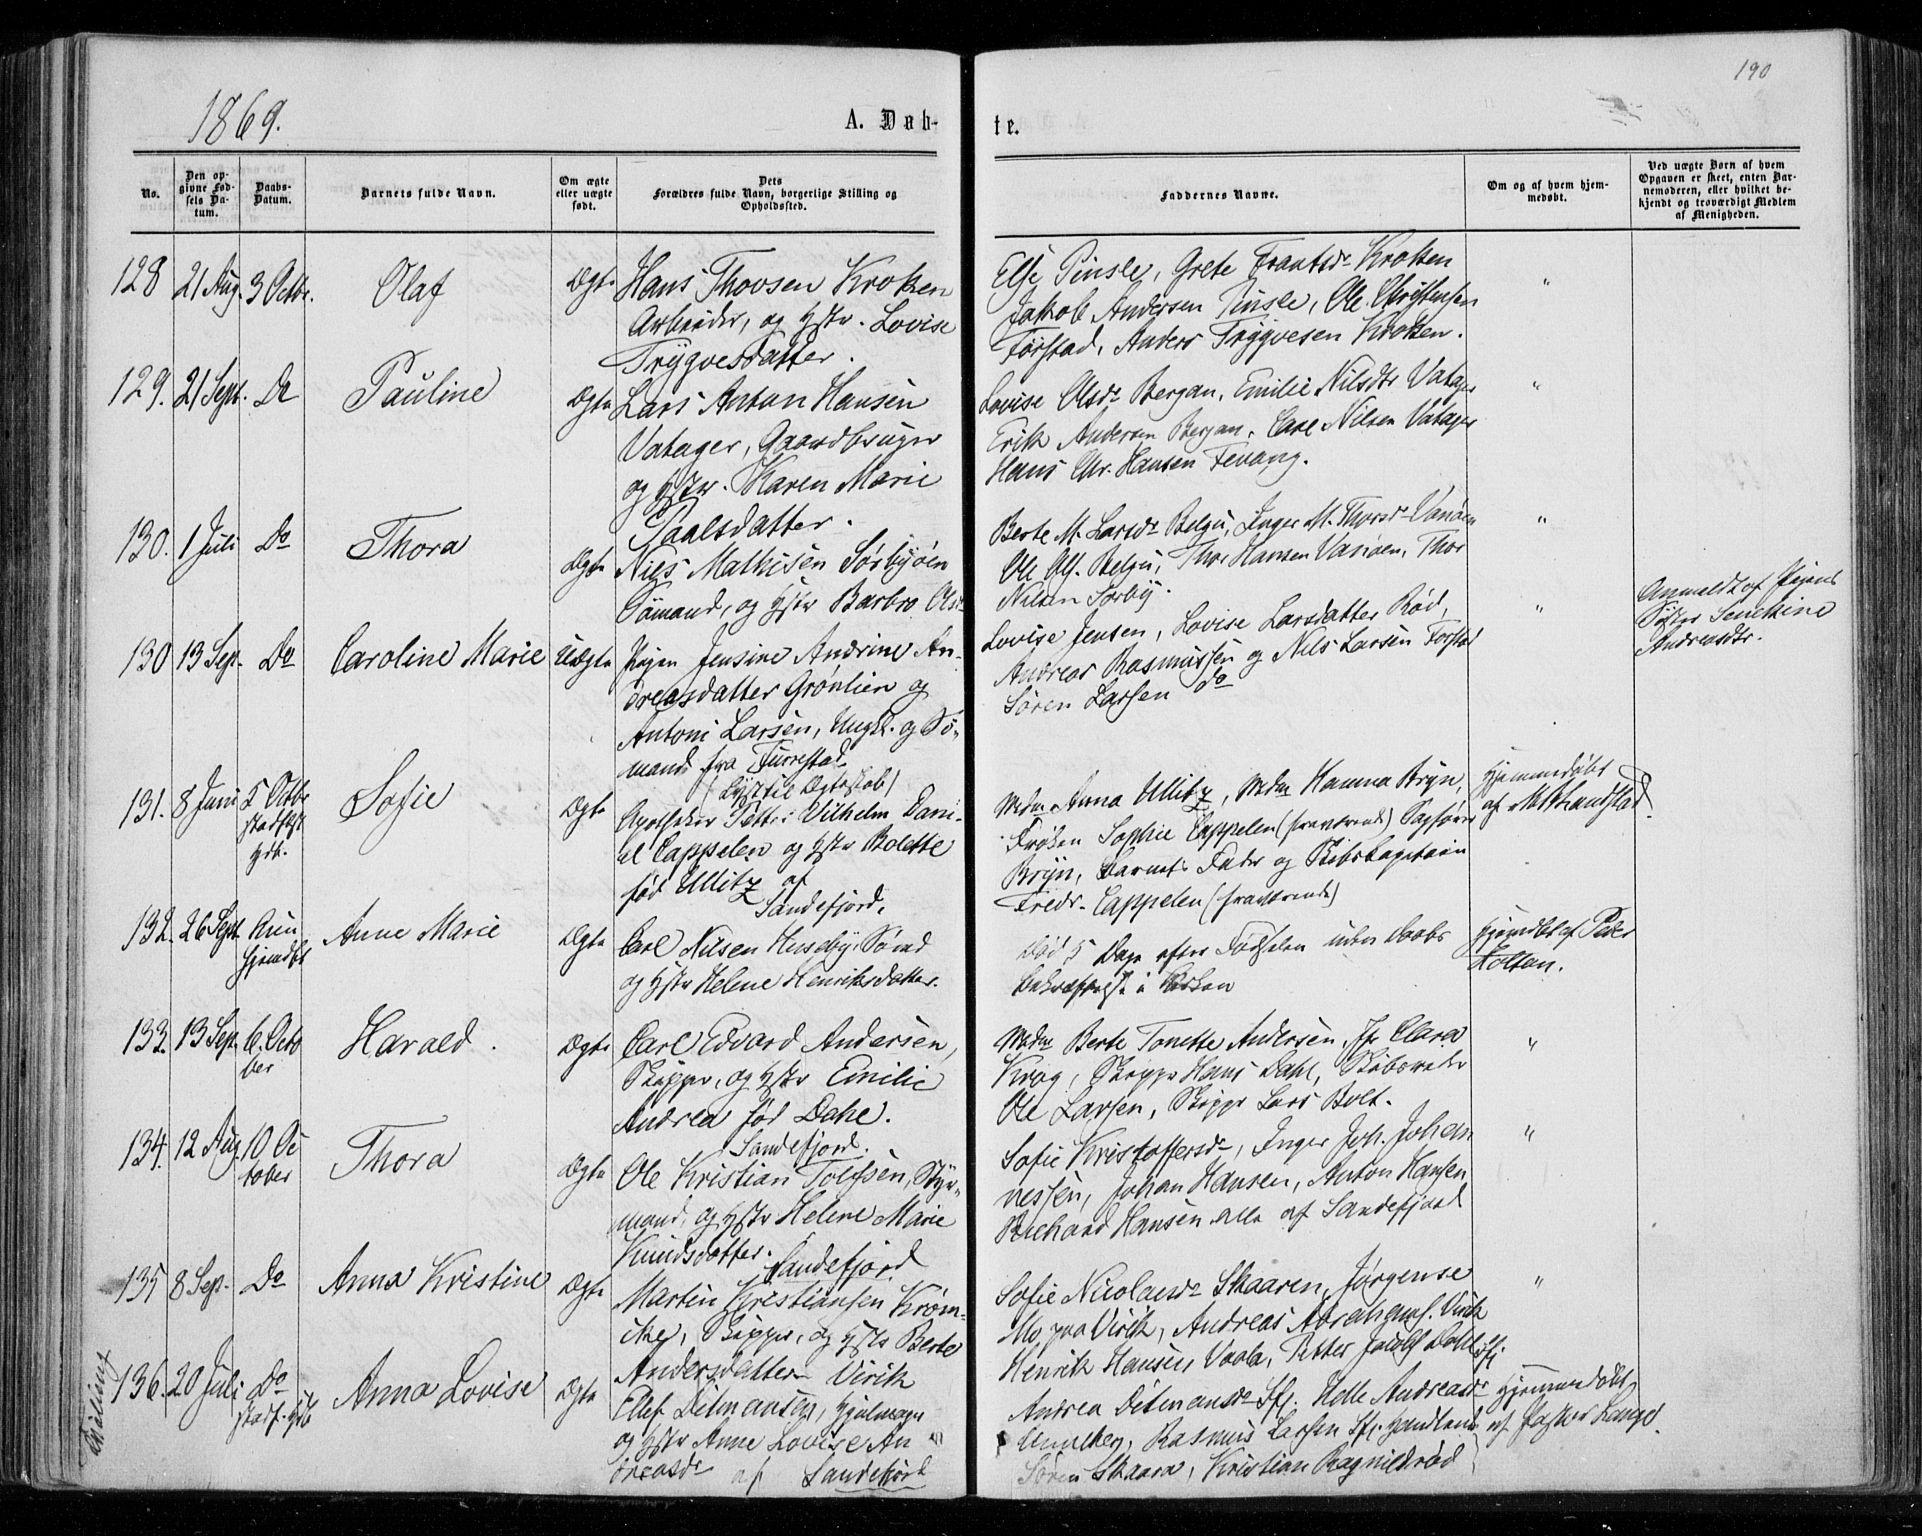 SAKO, Sandar kirkebøker, F/Fa/L0008: Parish register (official) no. 8, 1862-1871, p. 190